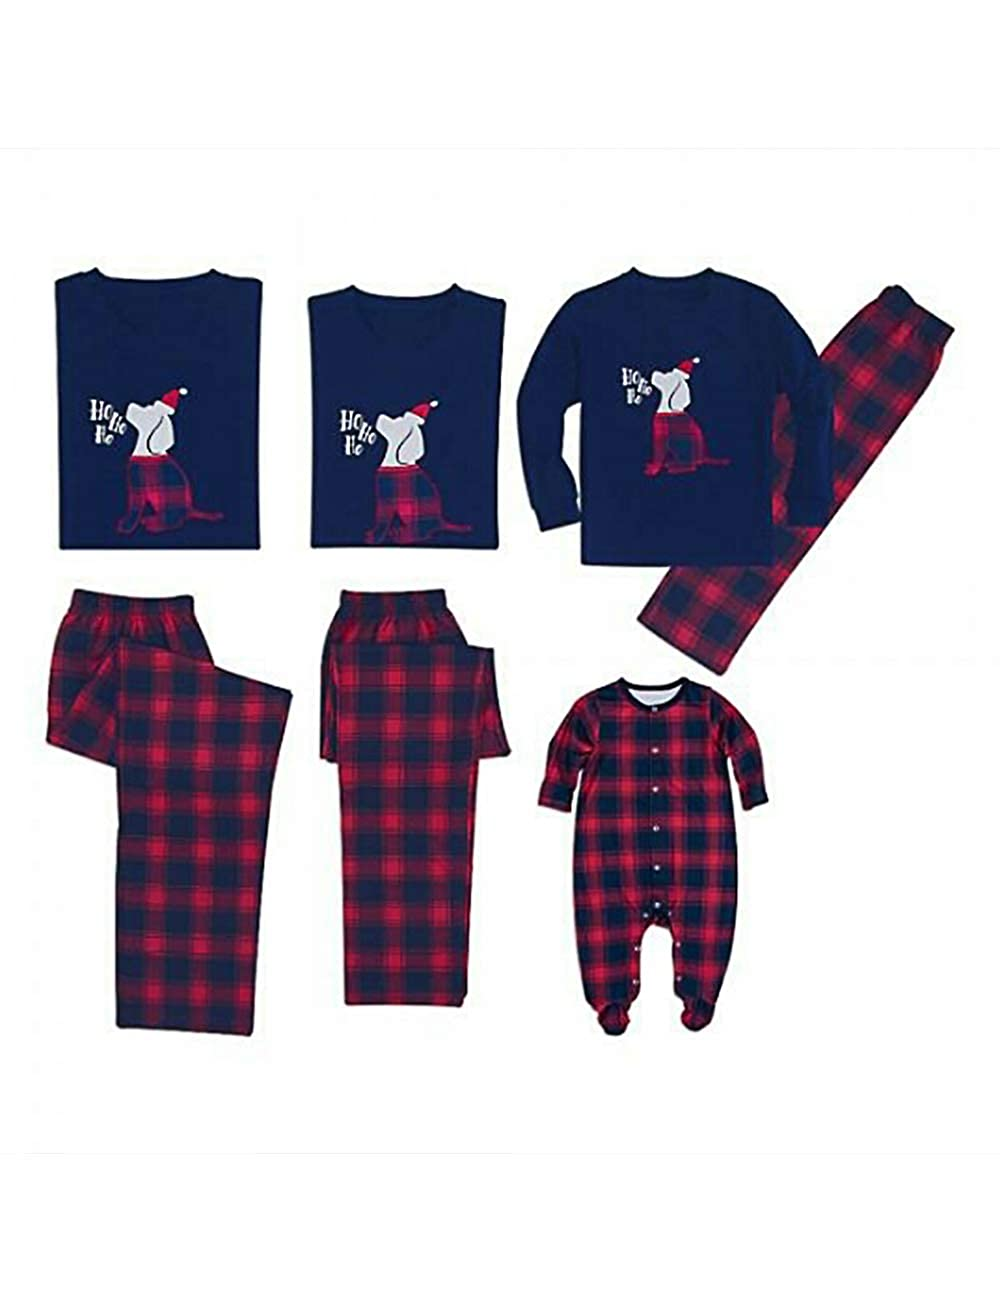 BESBOMIG Funny Pet Pattern Christmas Pajamas Set Family Matching T-Shirt Personalised